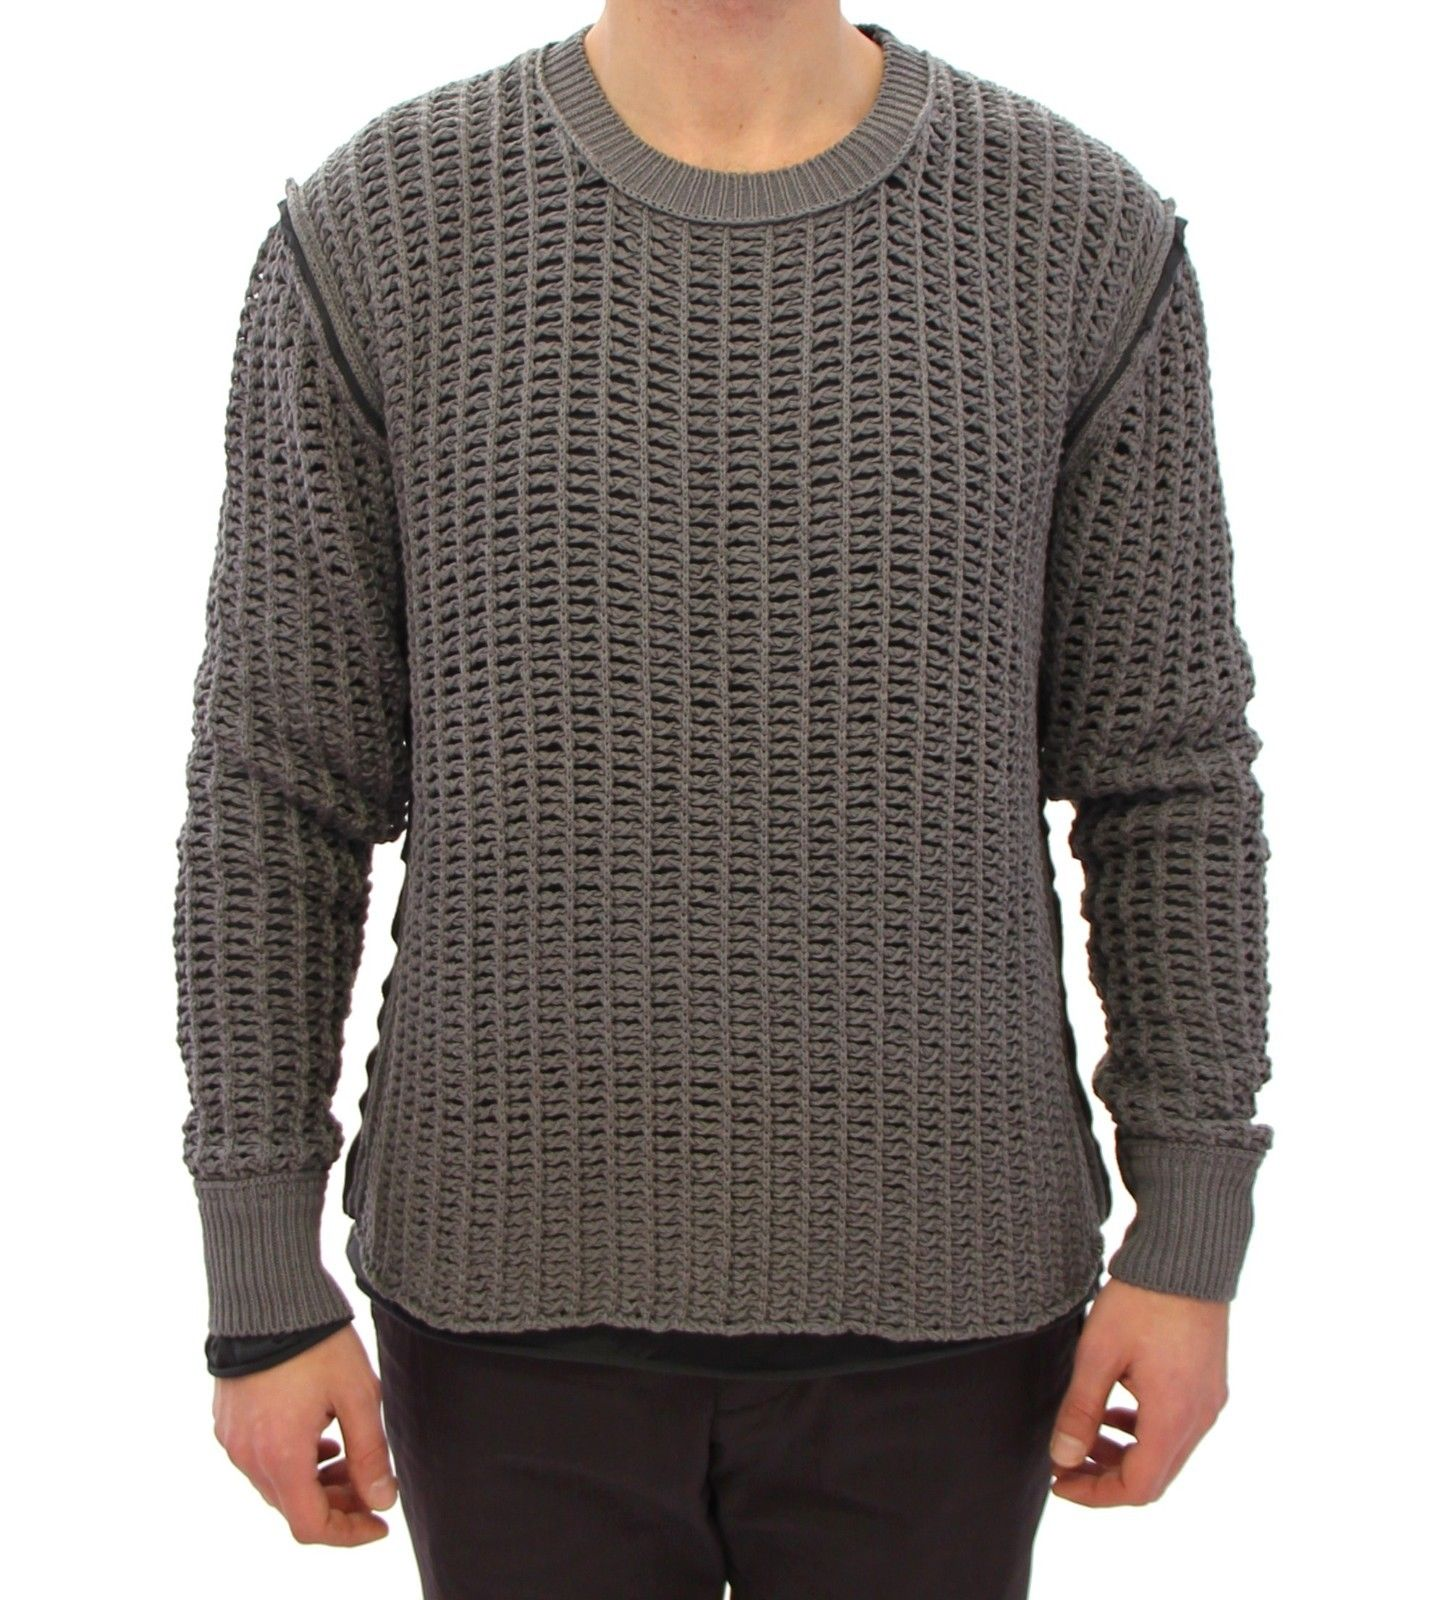 Dolce & Gabbana Men's Runway Netz Pullover Netted Sweater Gray GTH10683 - IT48   M